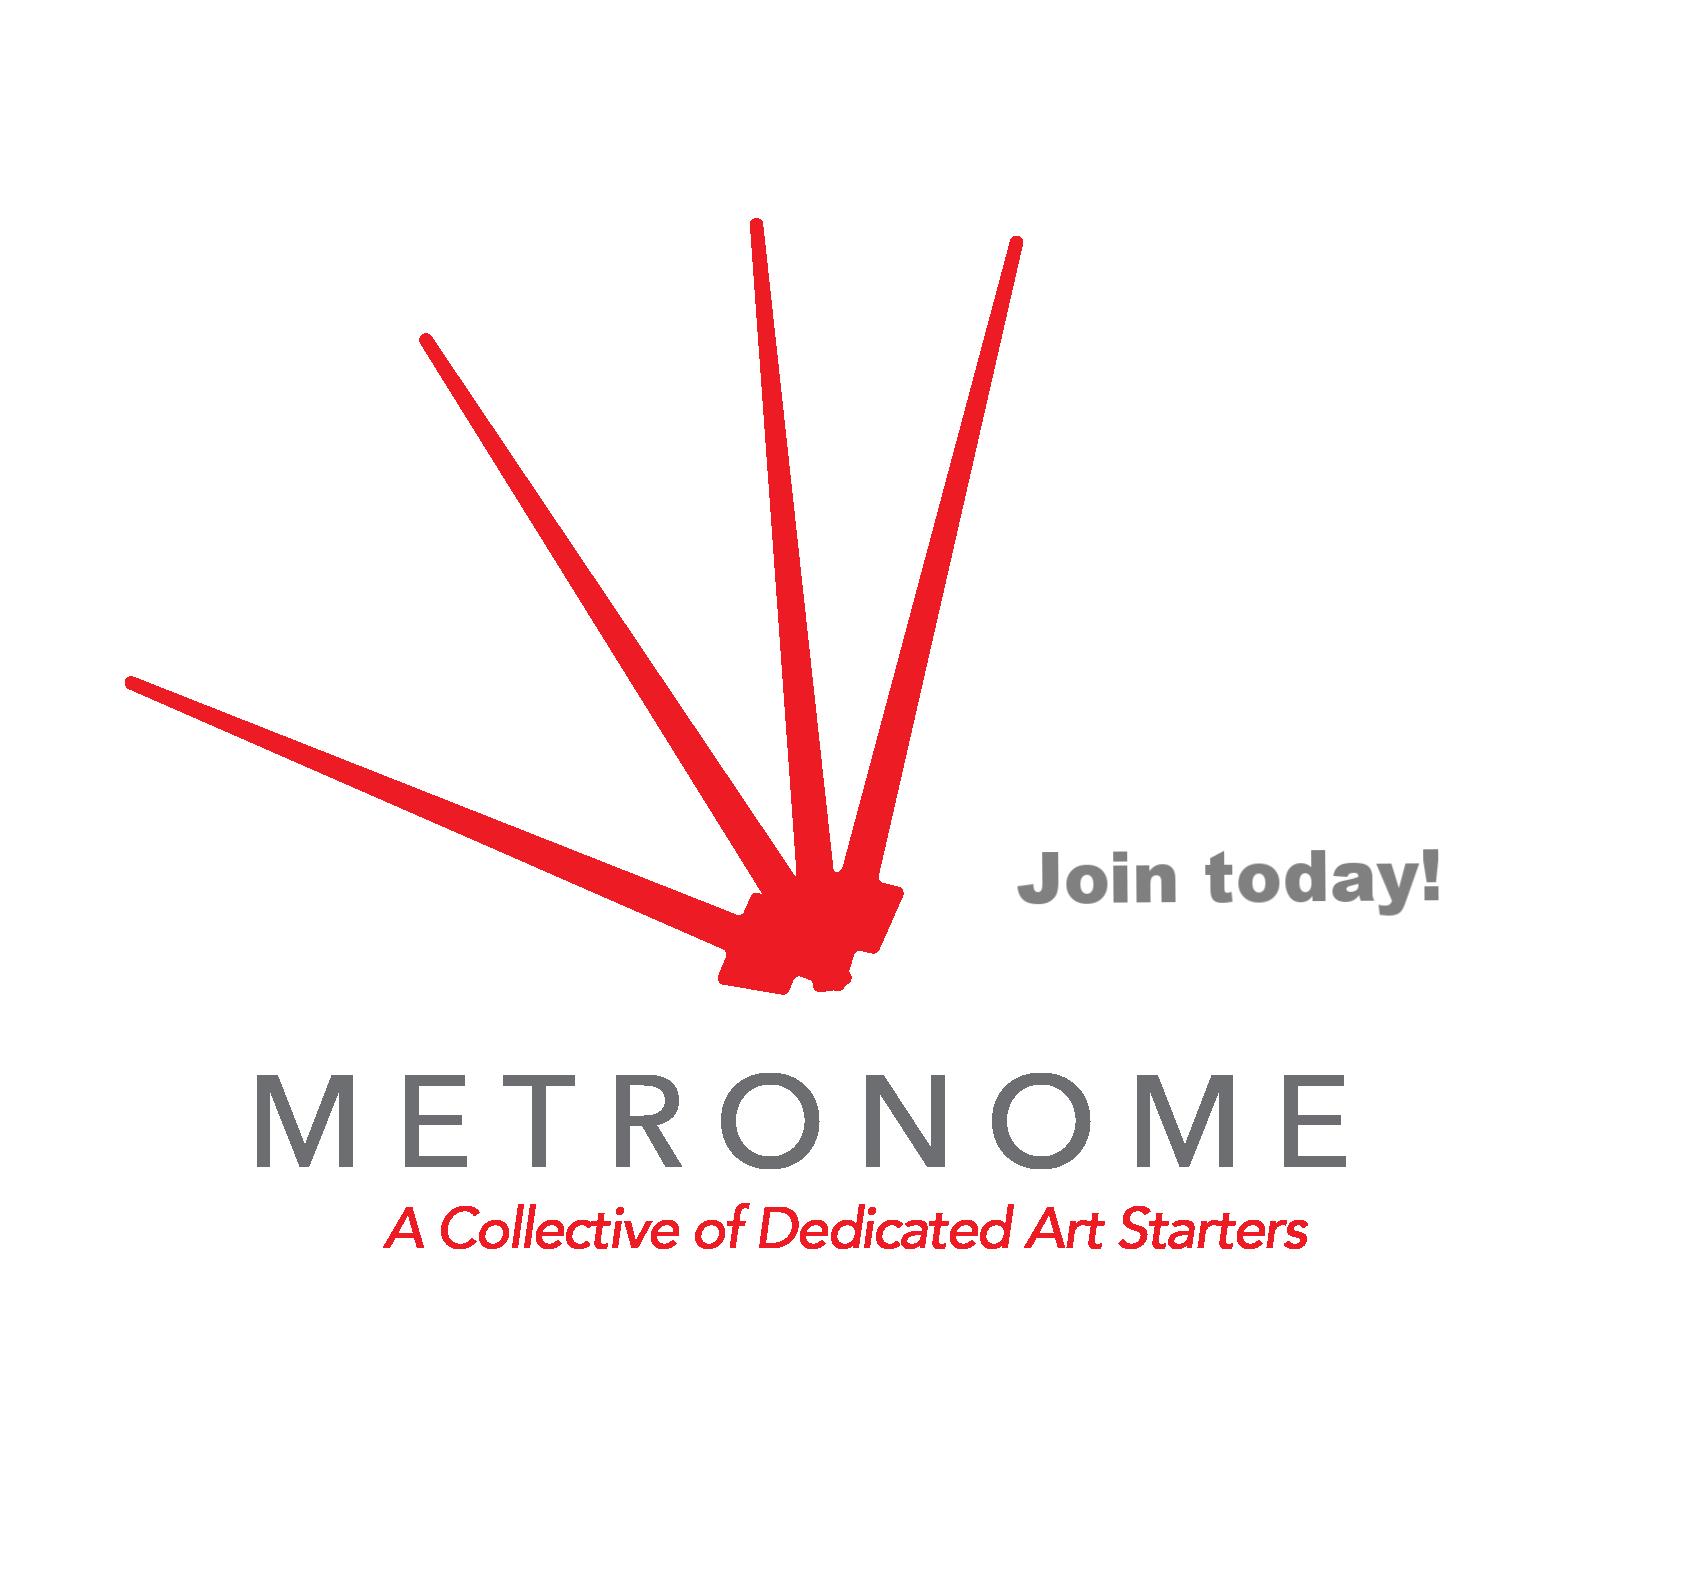 metronome_logos-01.png